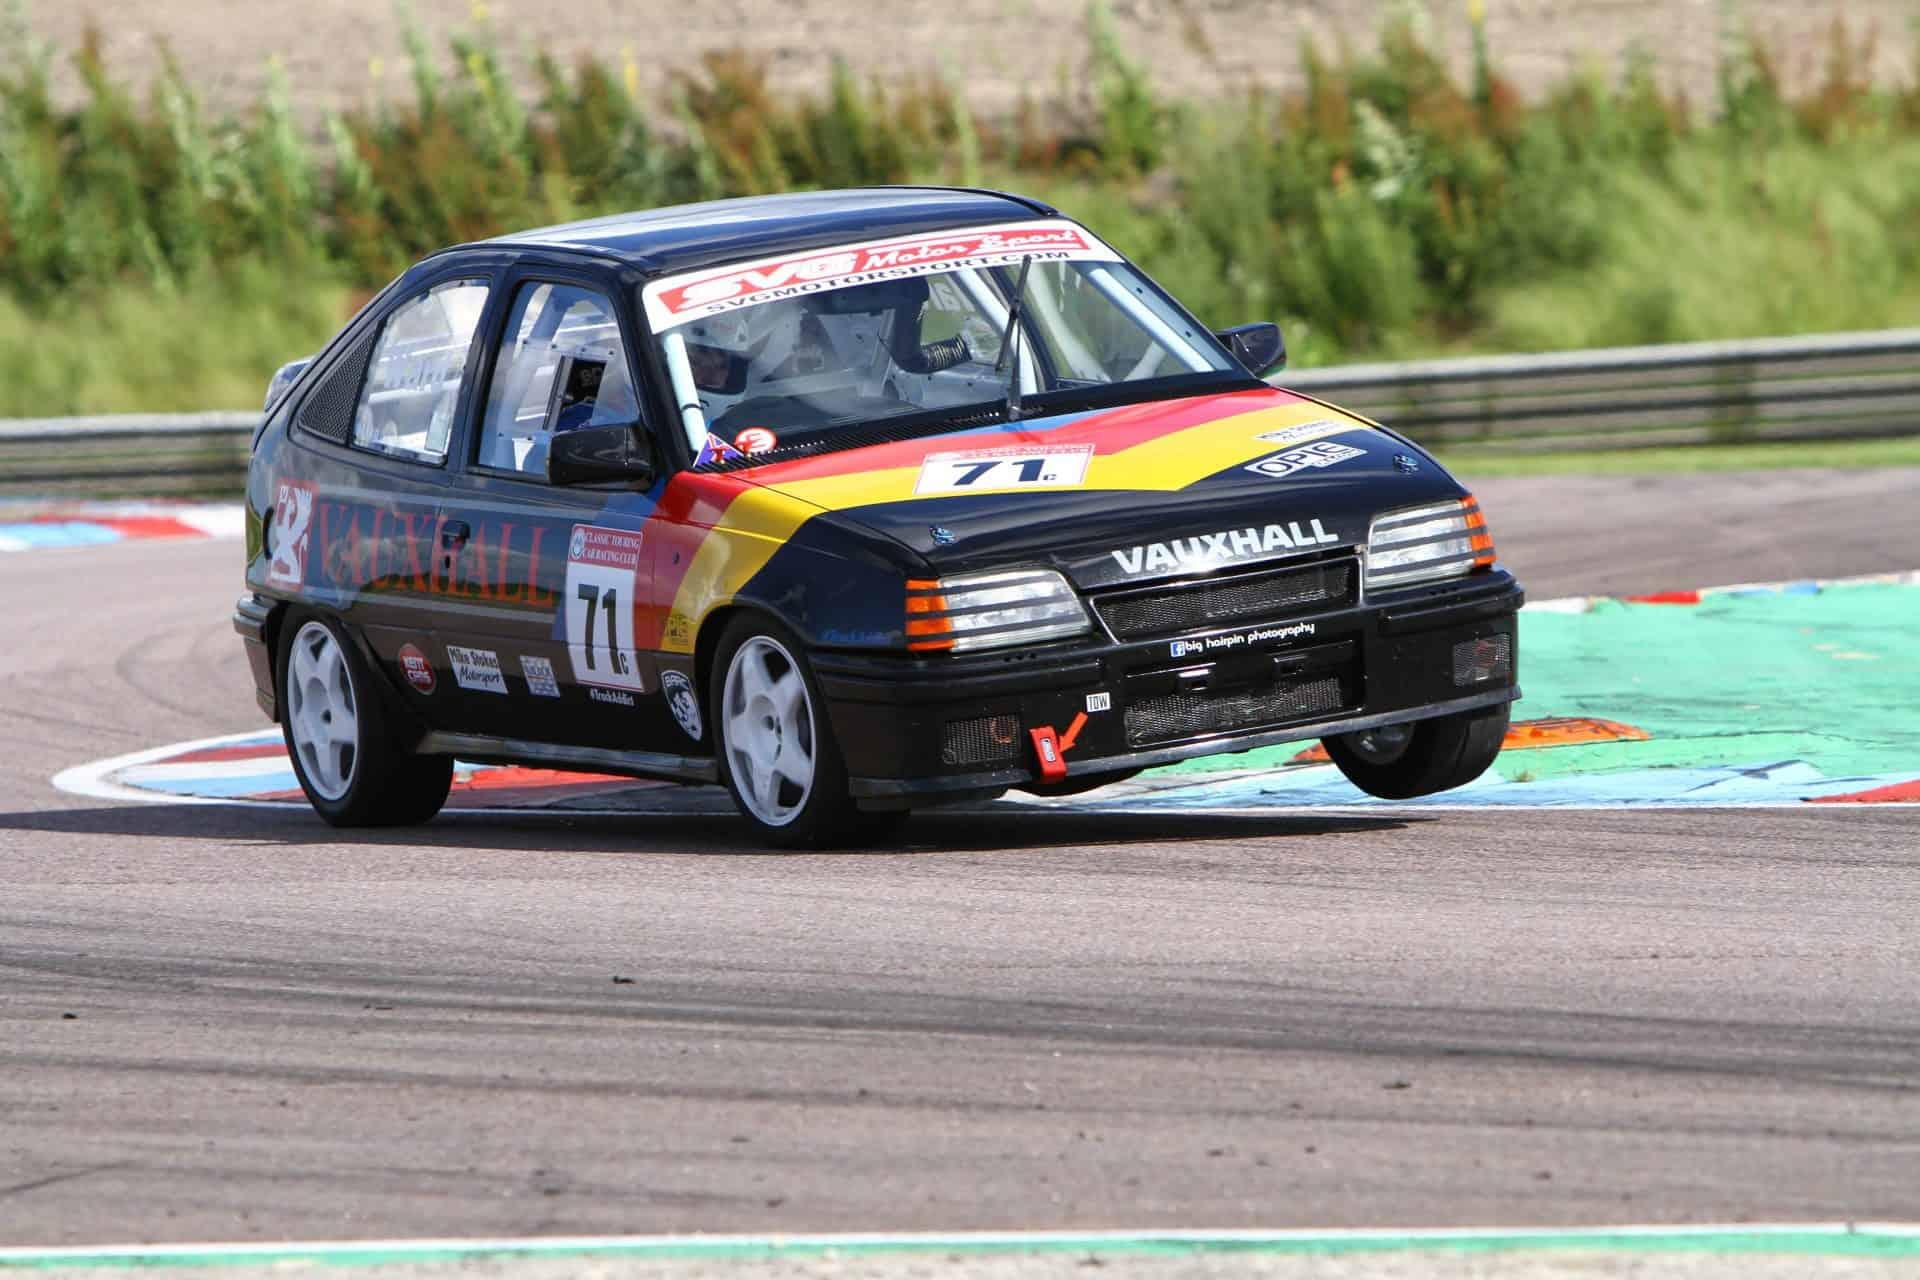 Vauxhall Astra F20